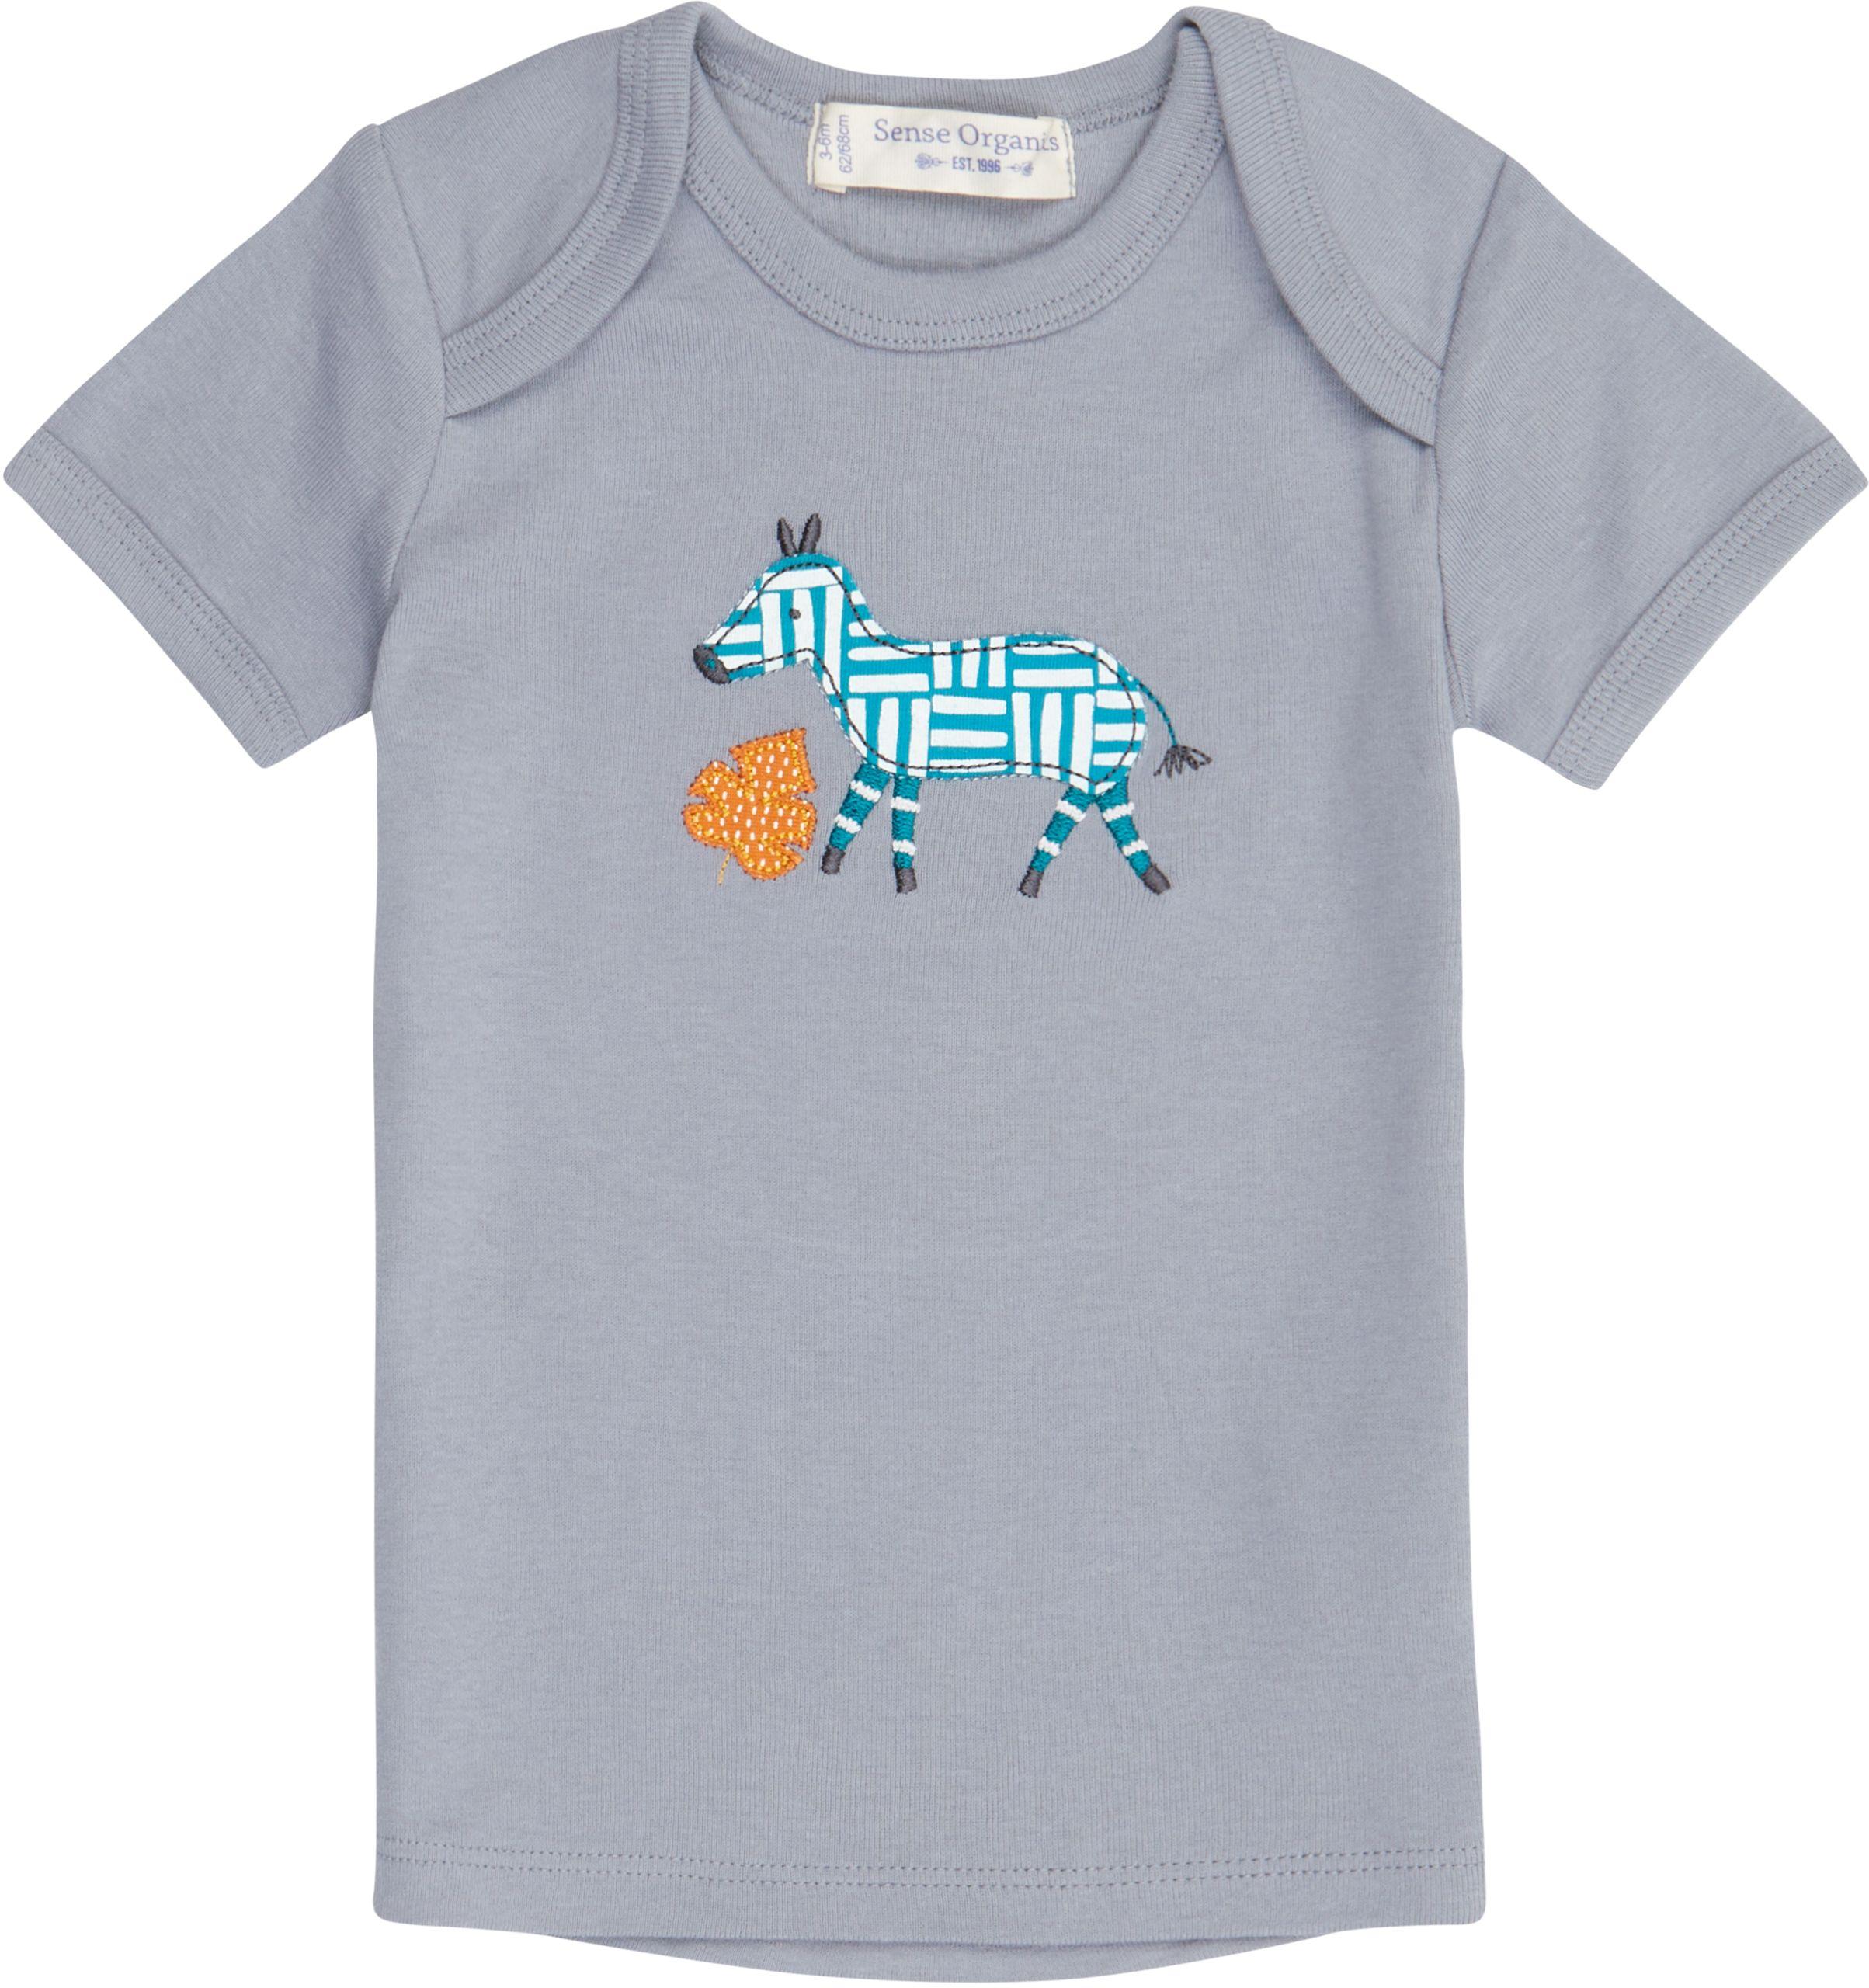 Sense Organic TILLY  RETRO Baby Shirt Kurzarm Dusty Blue